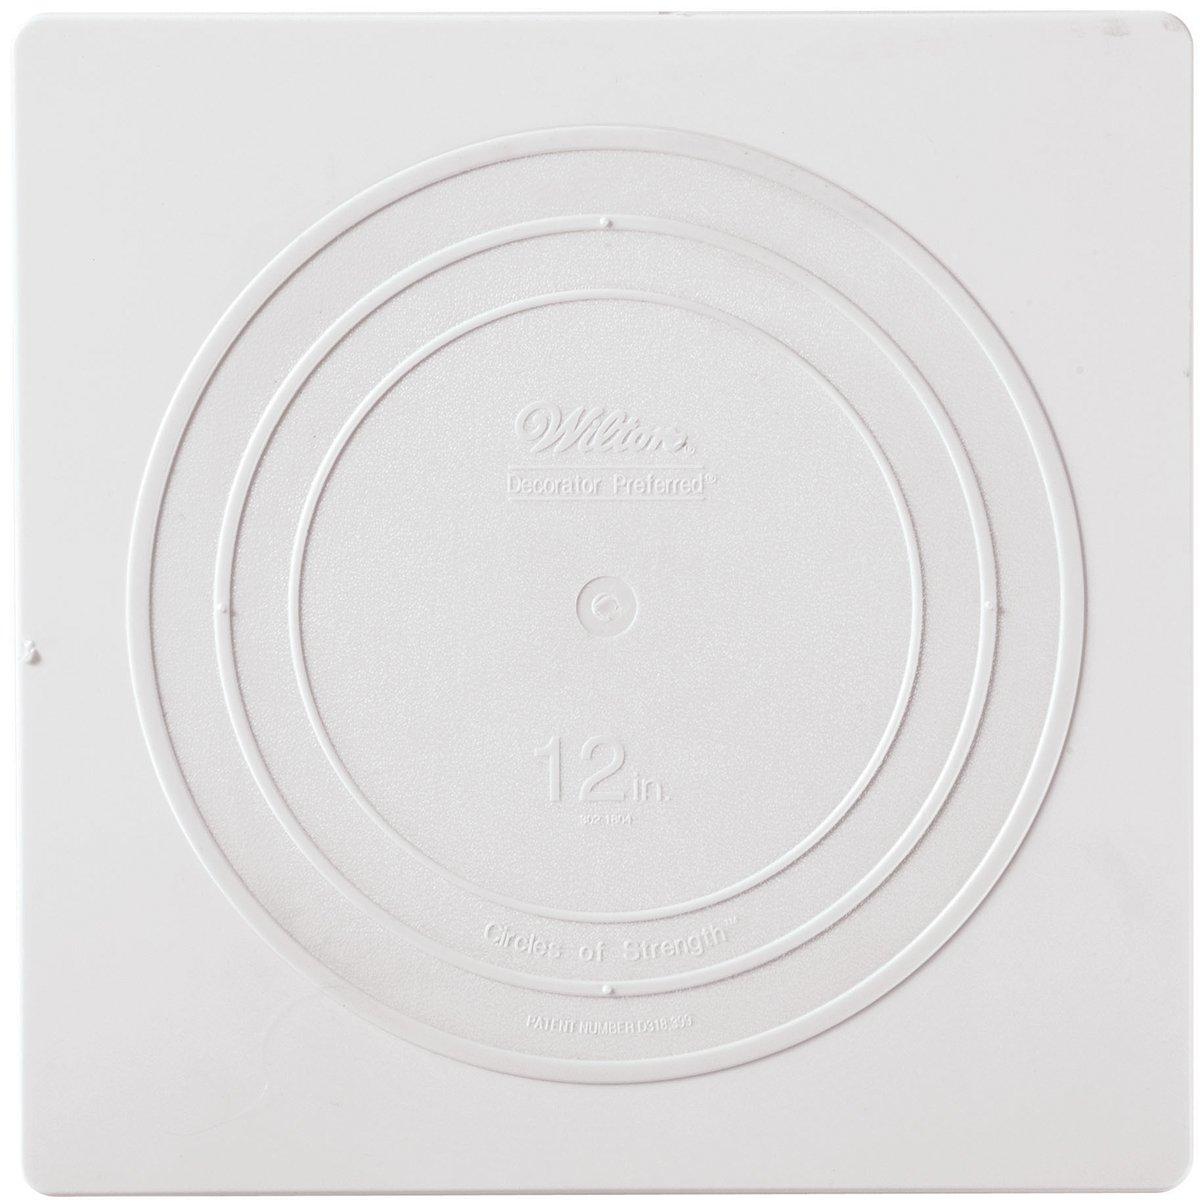 Wilton White Smooth Edge Square Separator Cake Plate